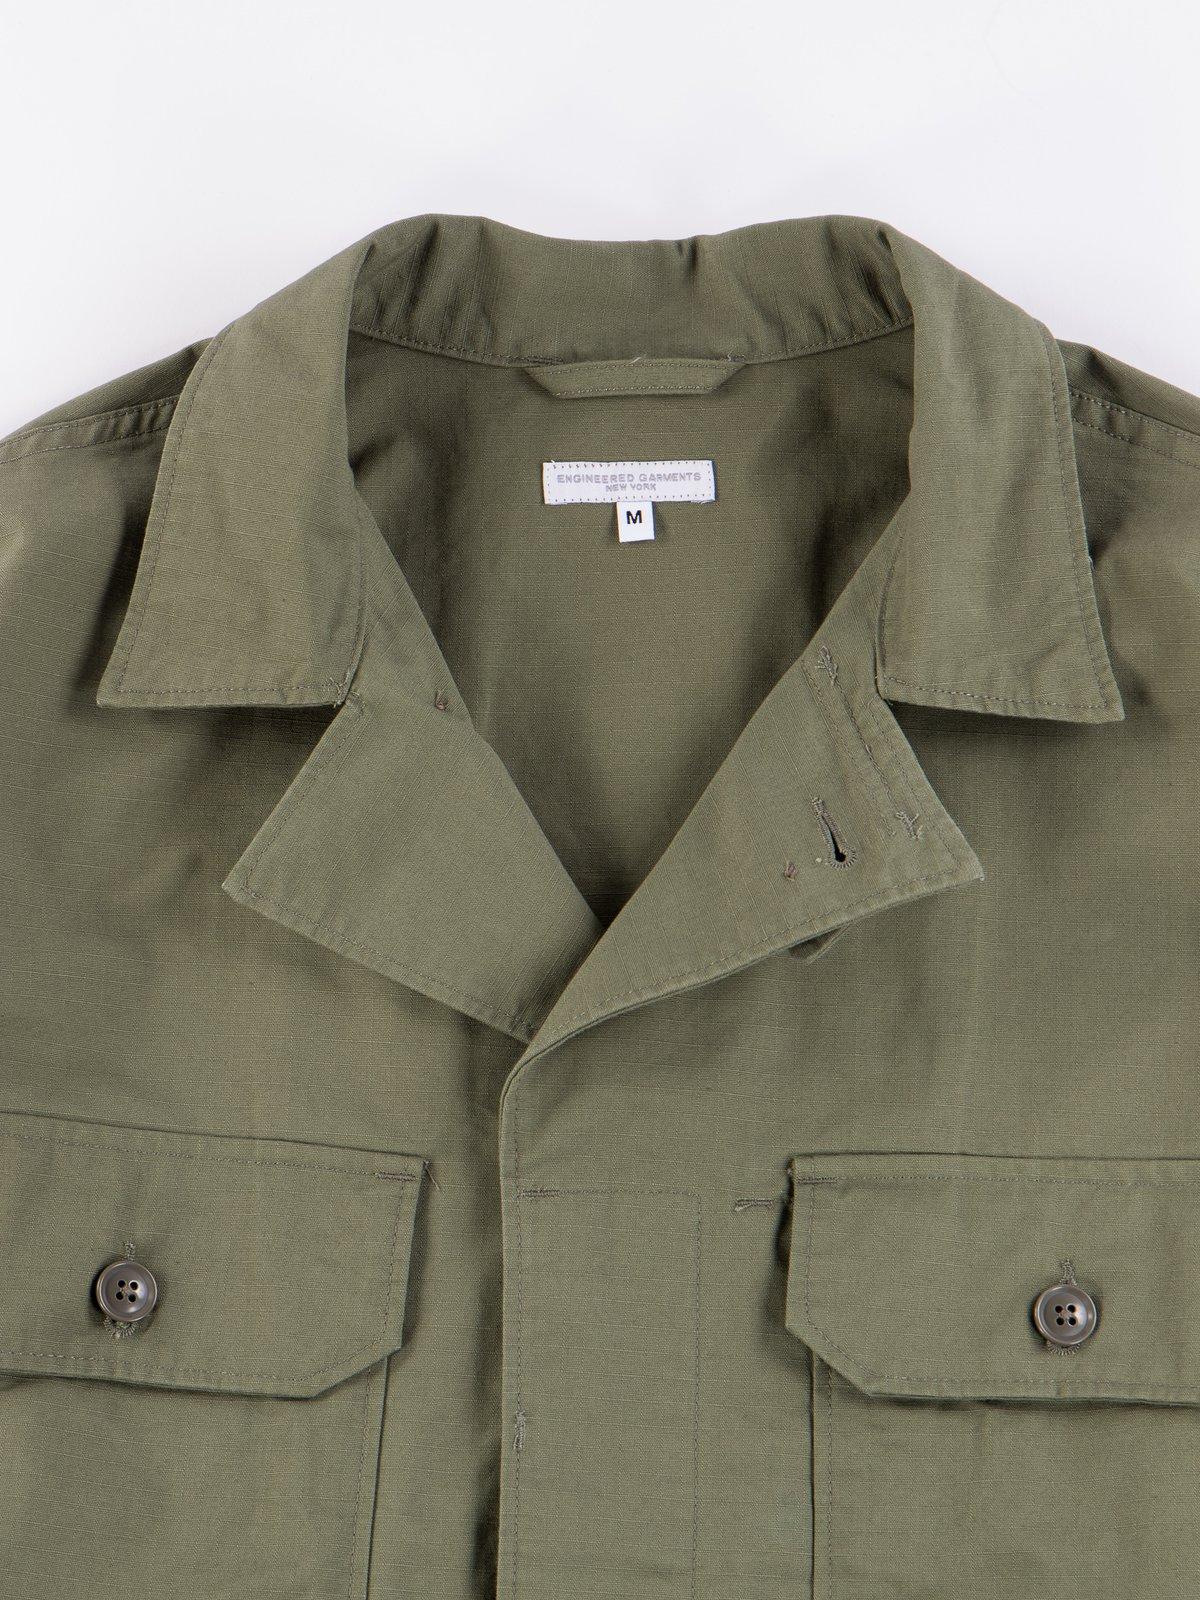 Olive Cotton Ripstop MC Shirt Jacket - Image 6